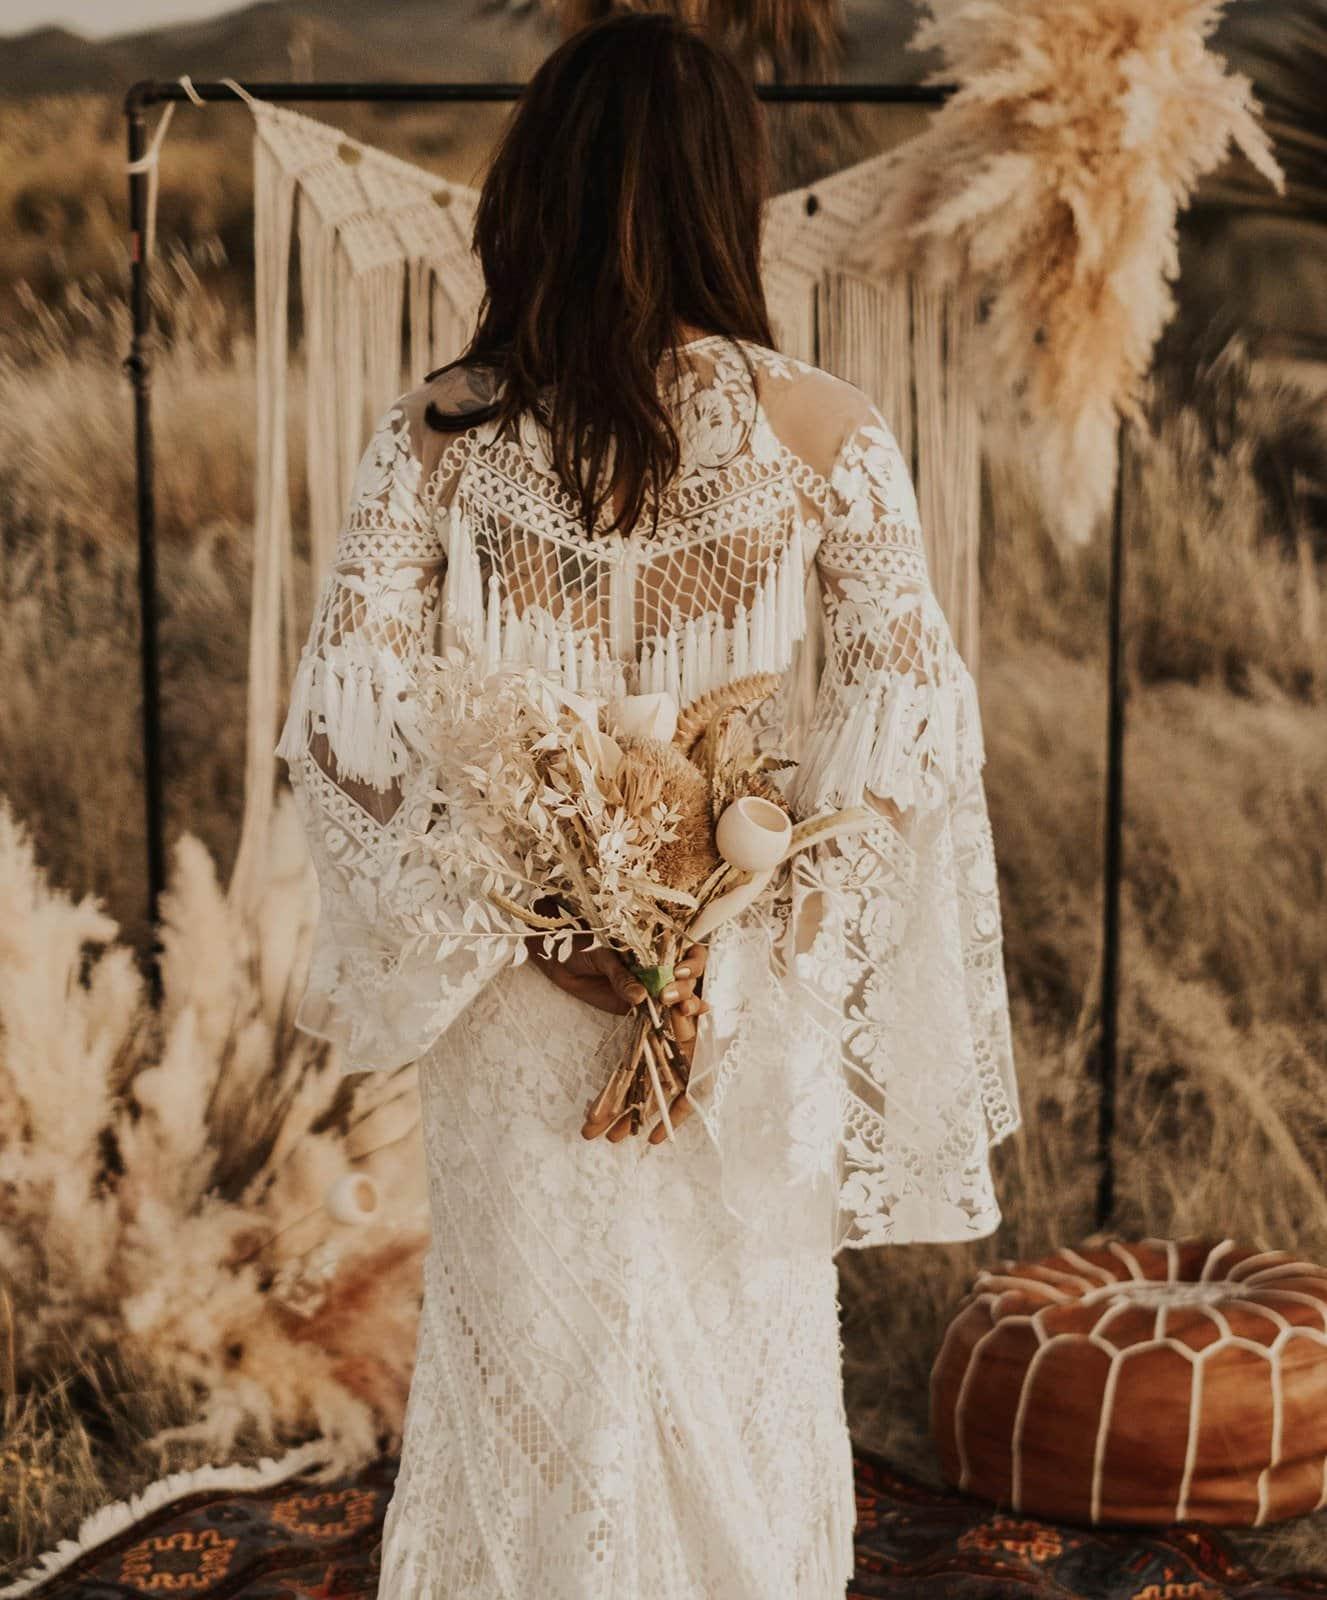 Bridal bouquet and wedding dress inspo